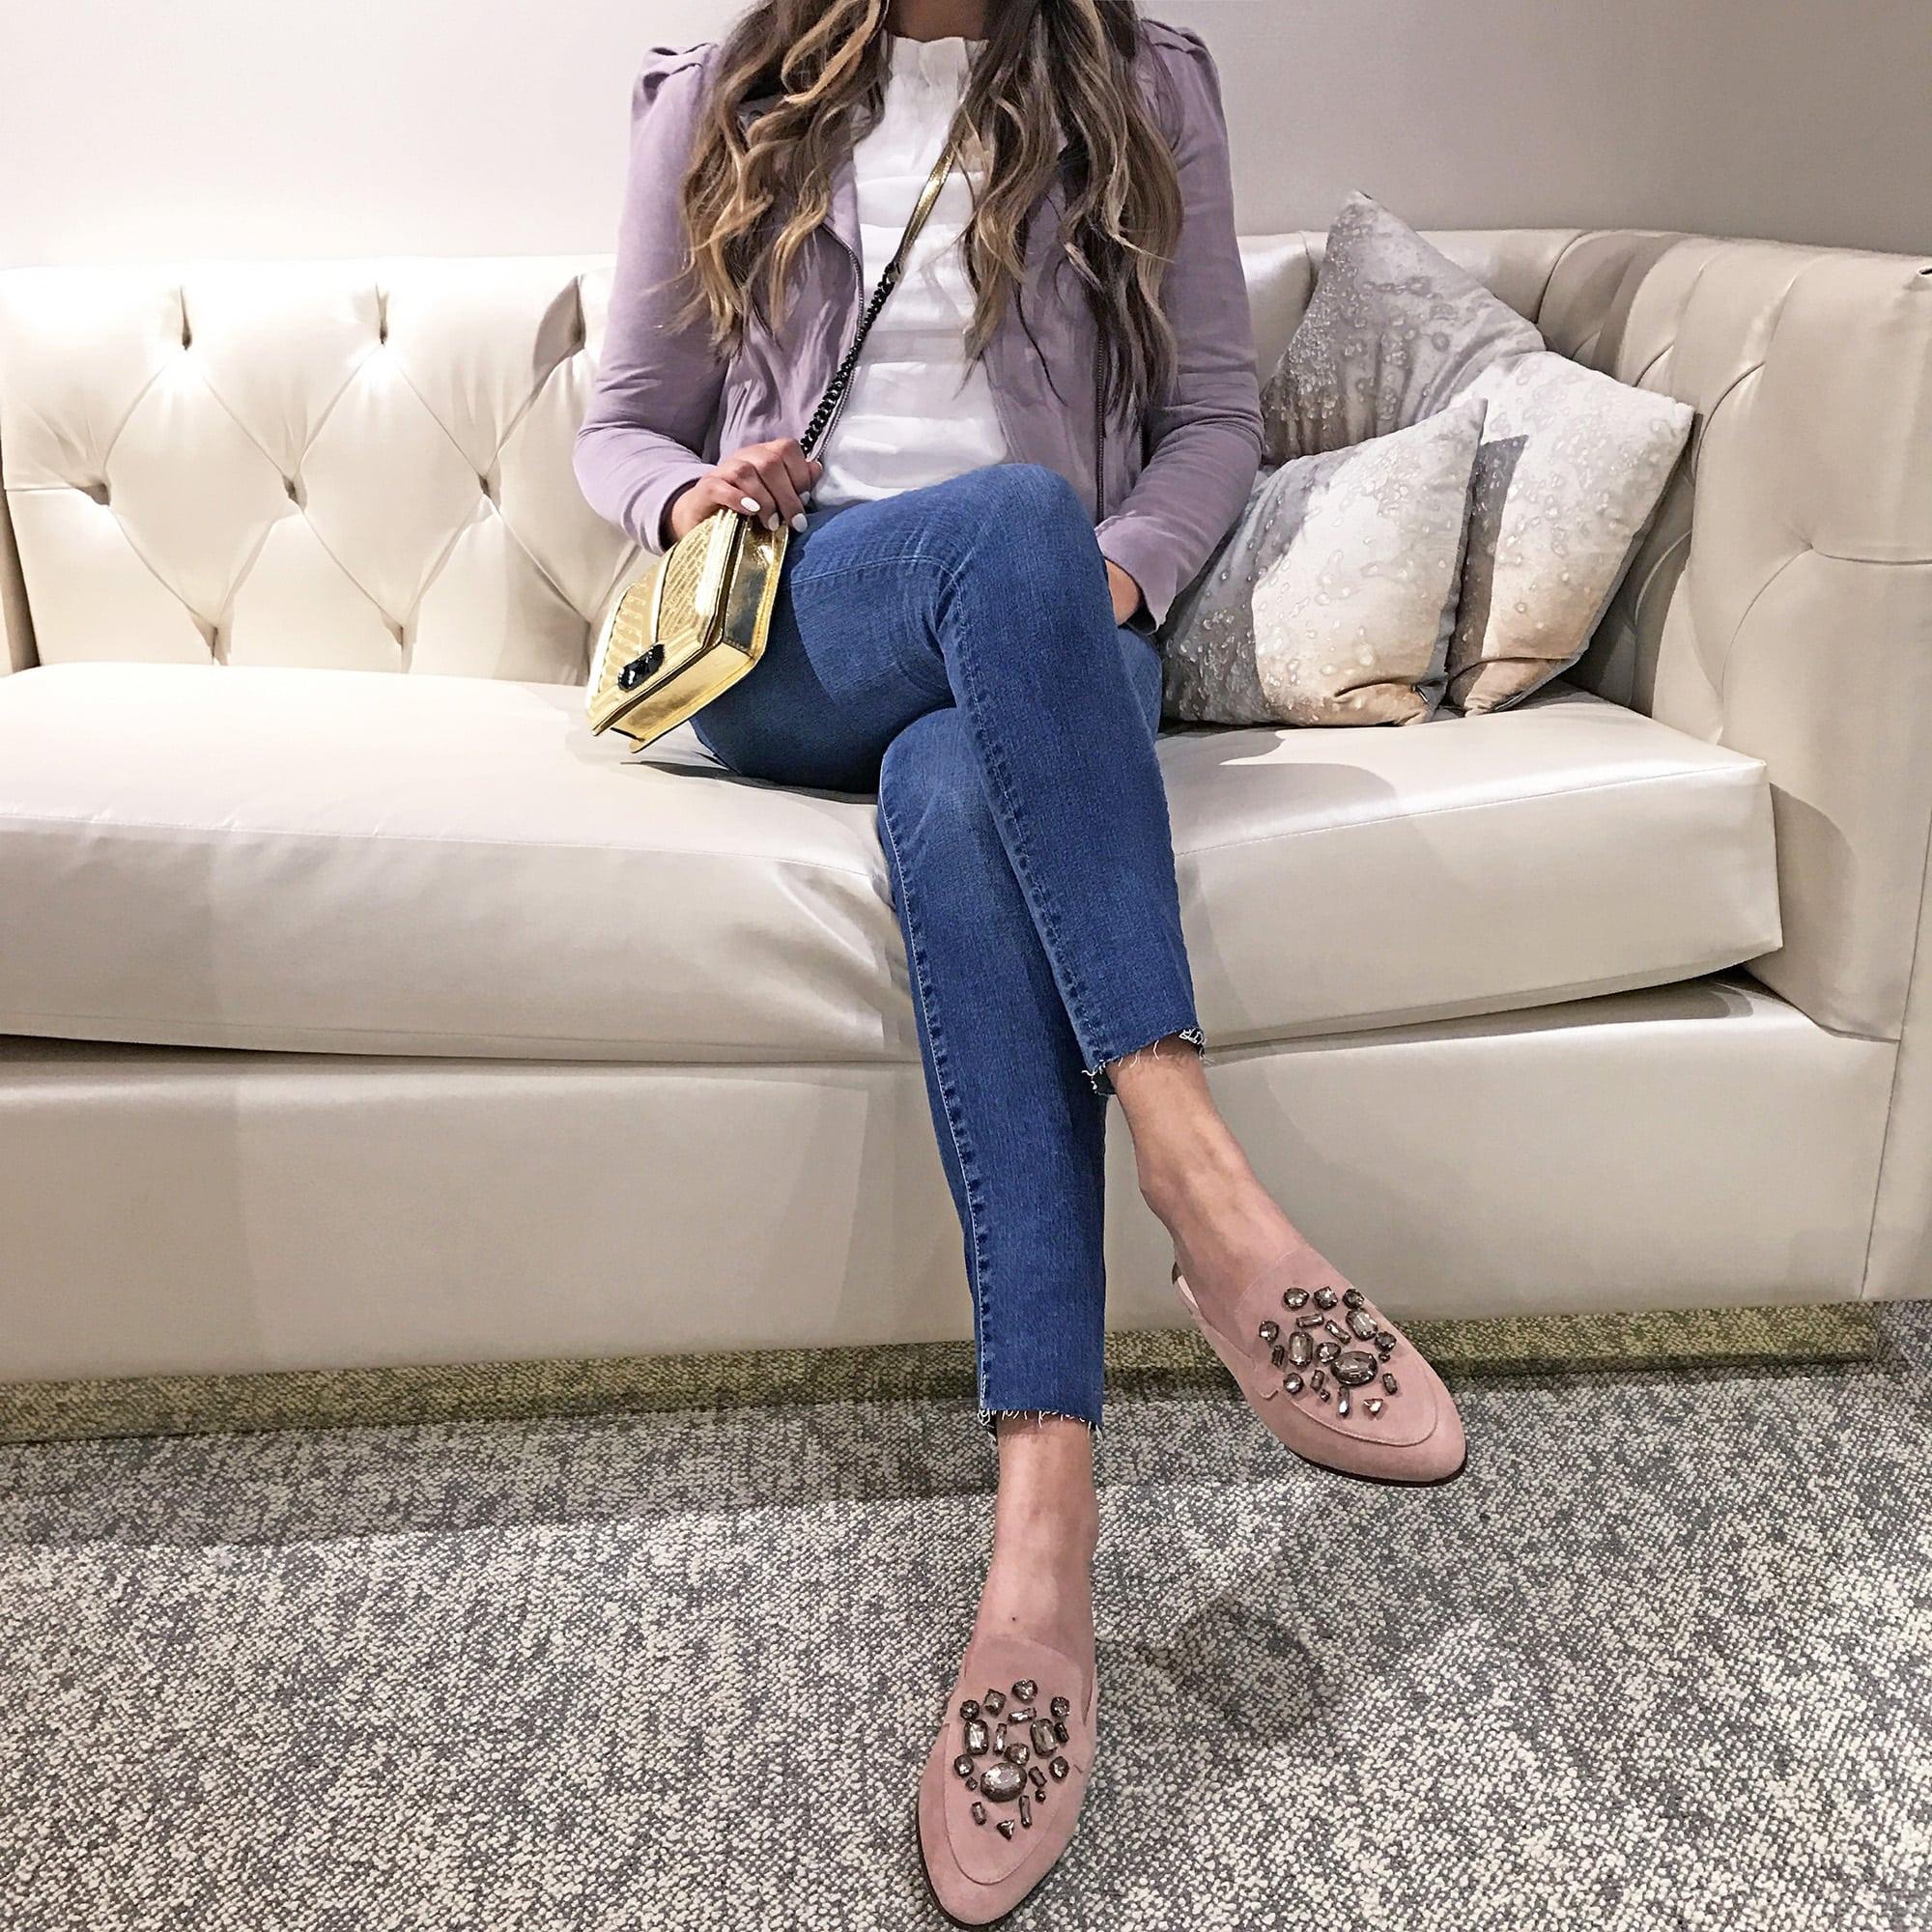 Nordstrom try on haul | beauty style blogger Mash Elle |  Nordstrom Anniversary Sale | moto jacket